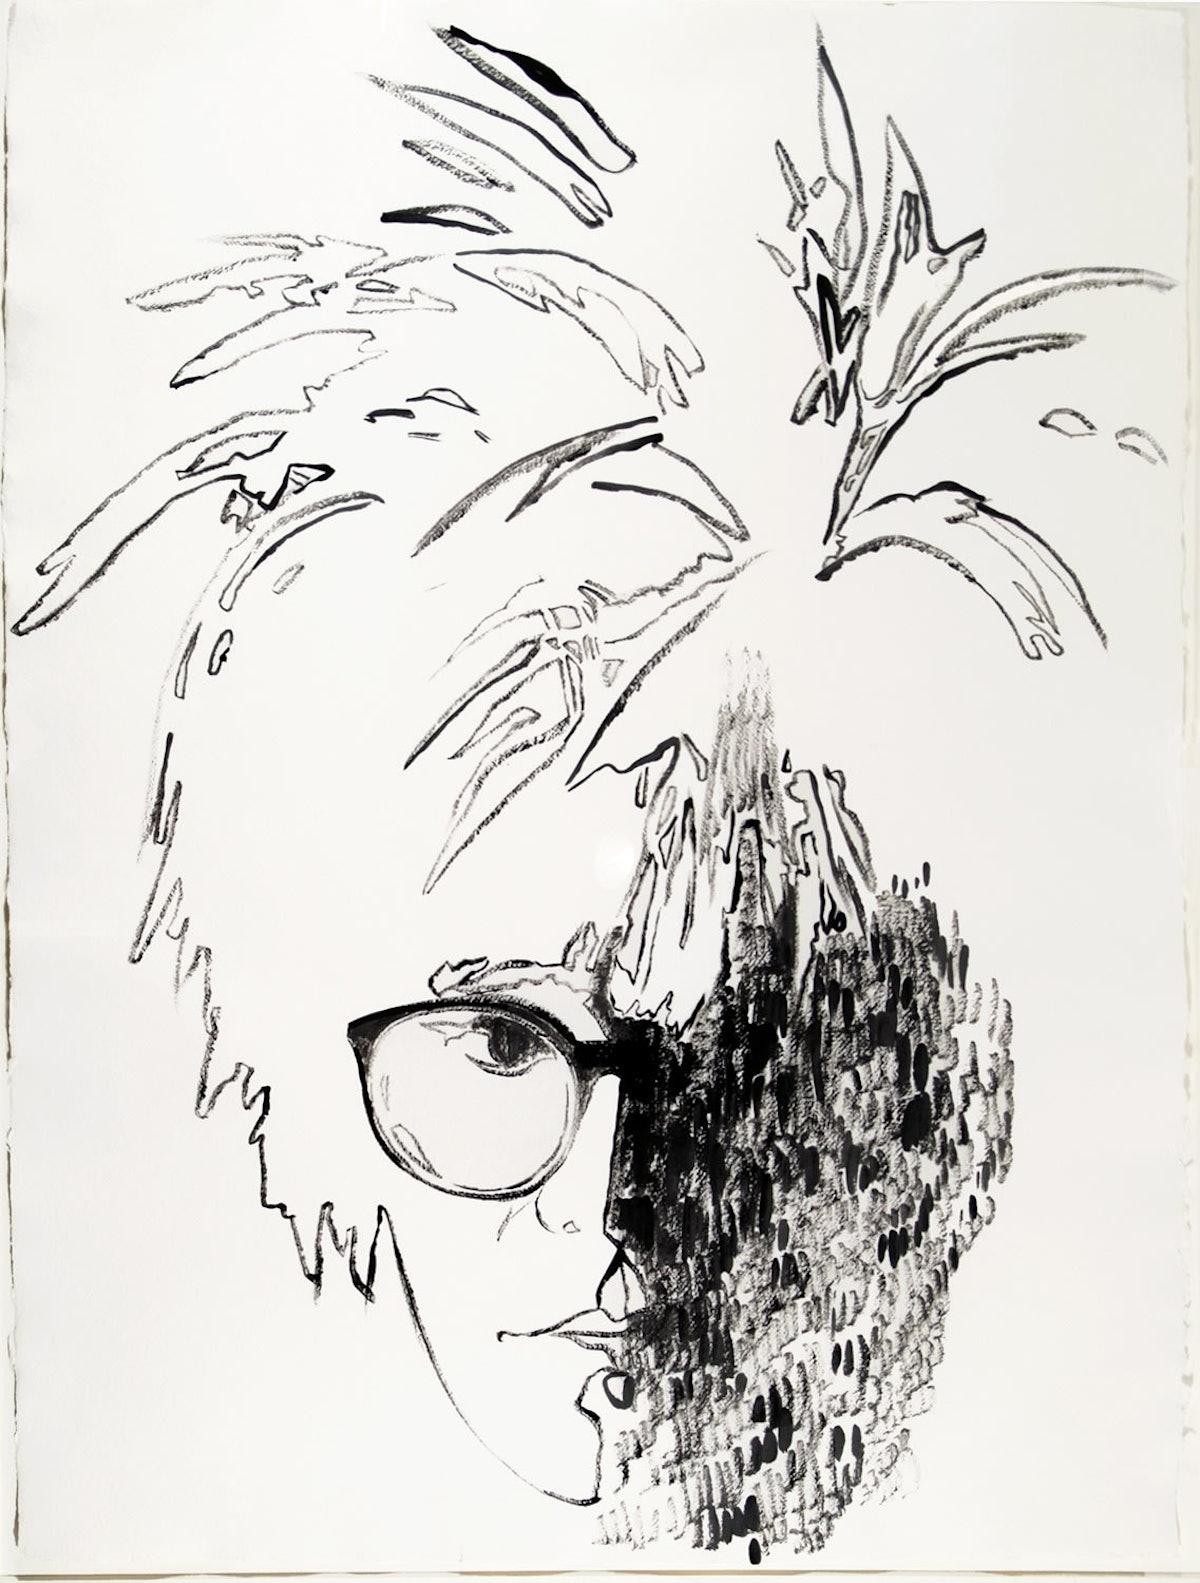 Warhol_Andy_SelfPortrait_pk12046.jpg